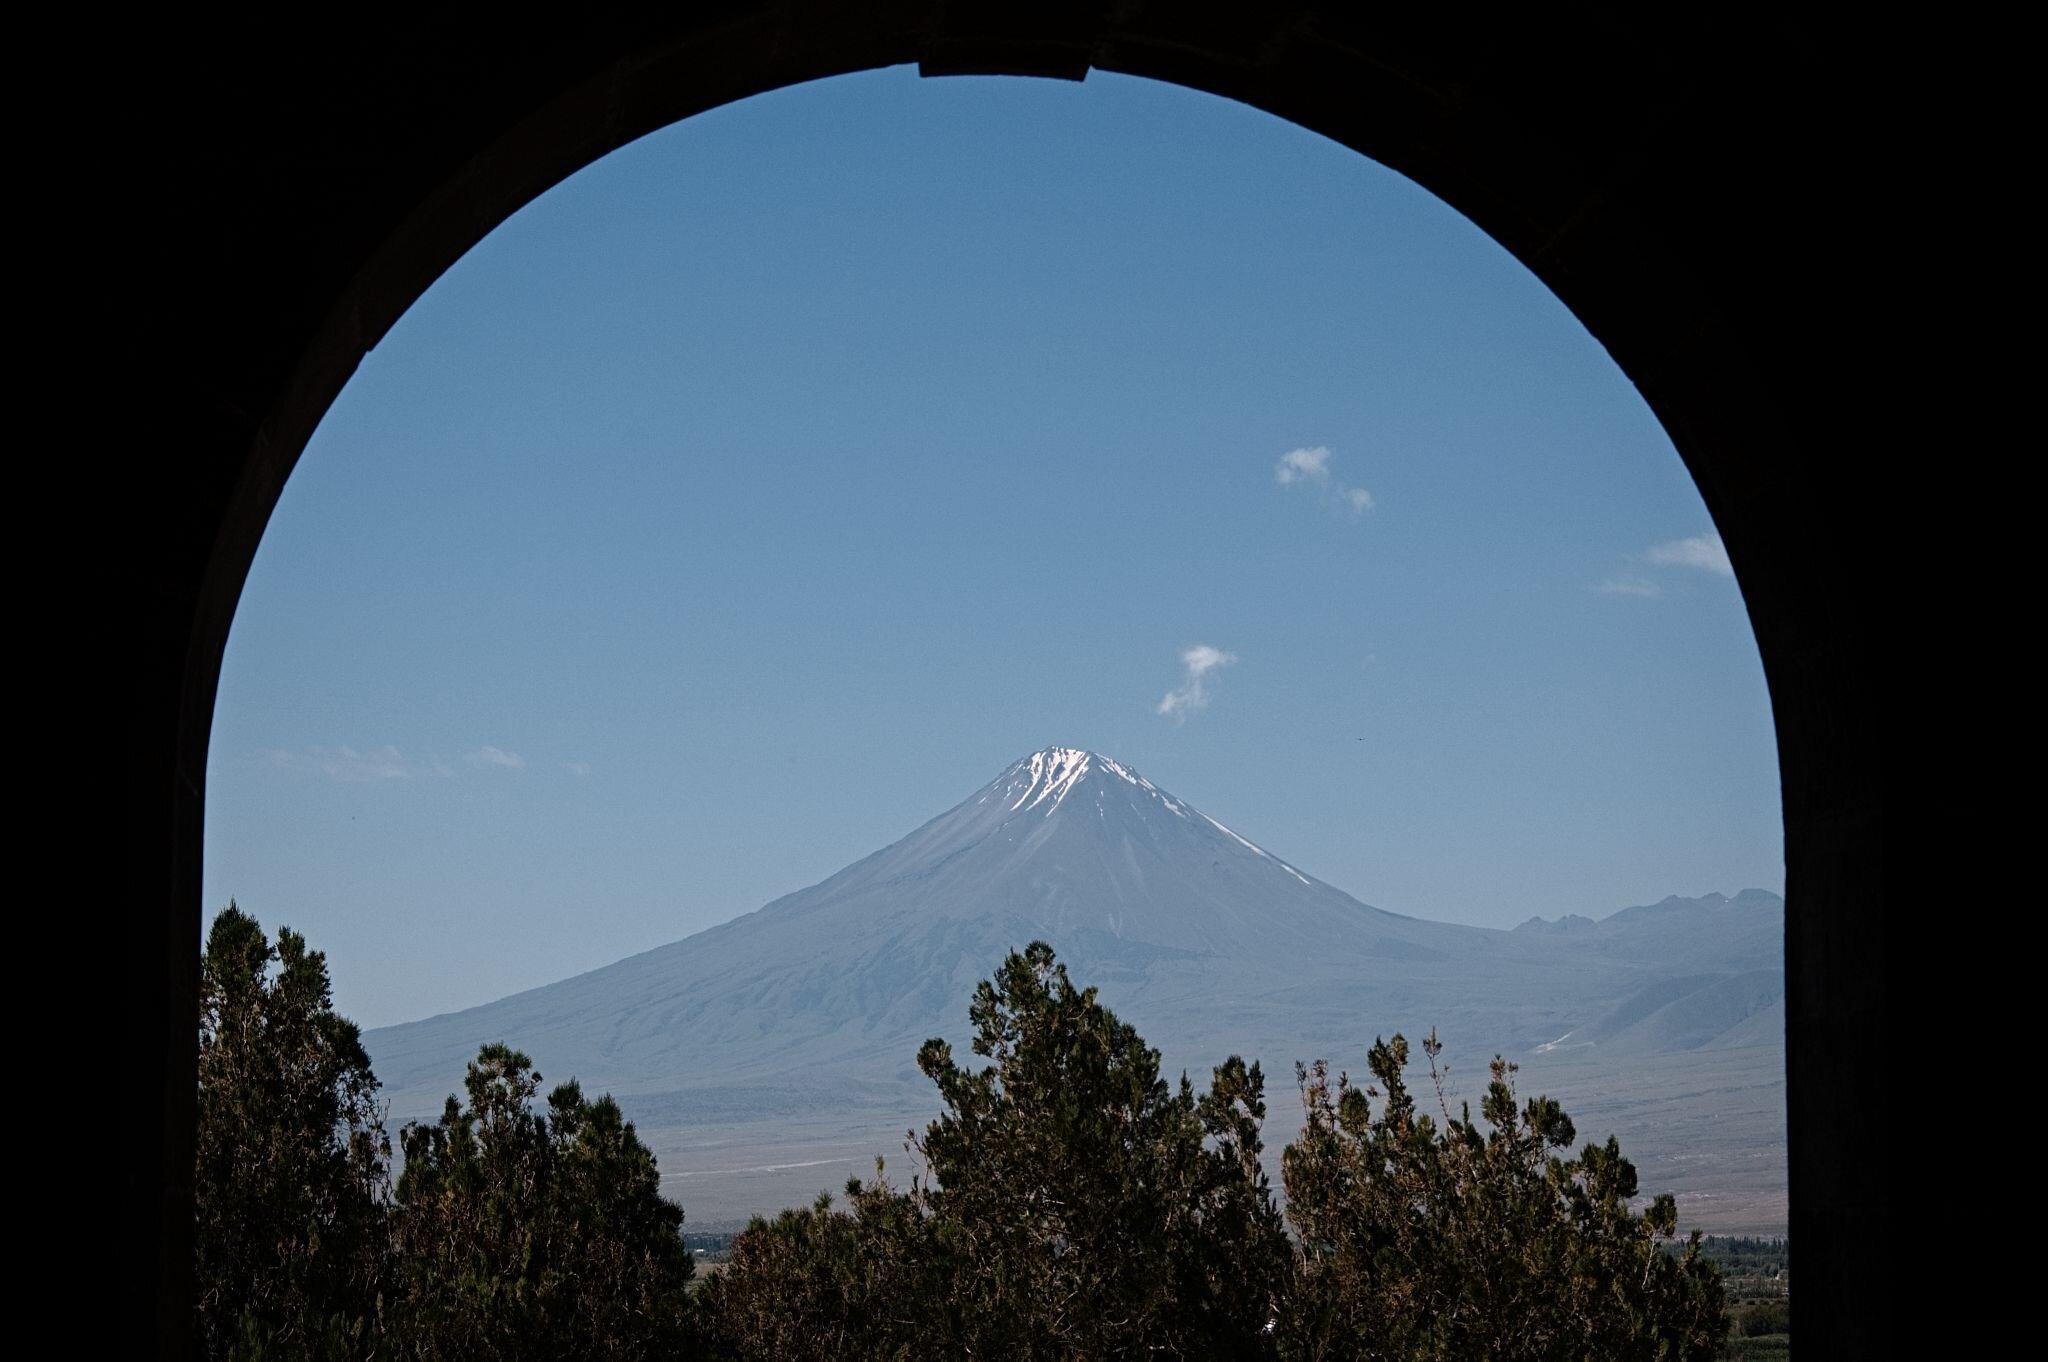 Berg Ararat im Torbogen